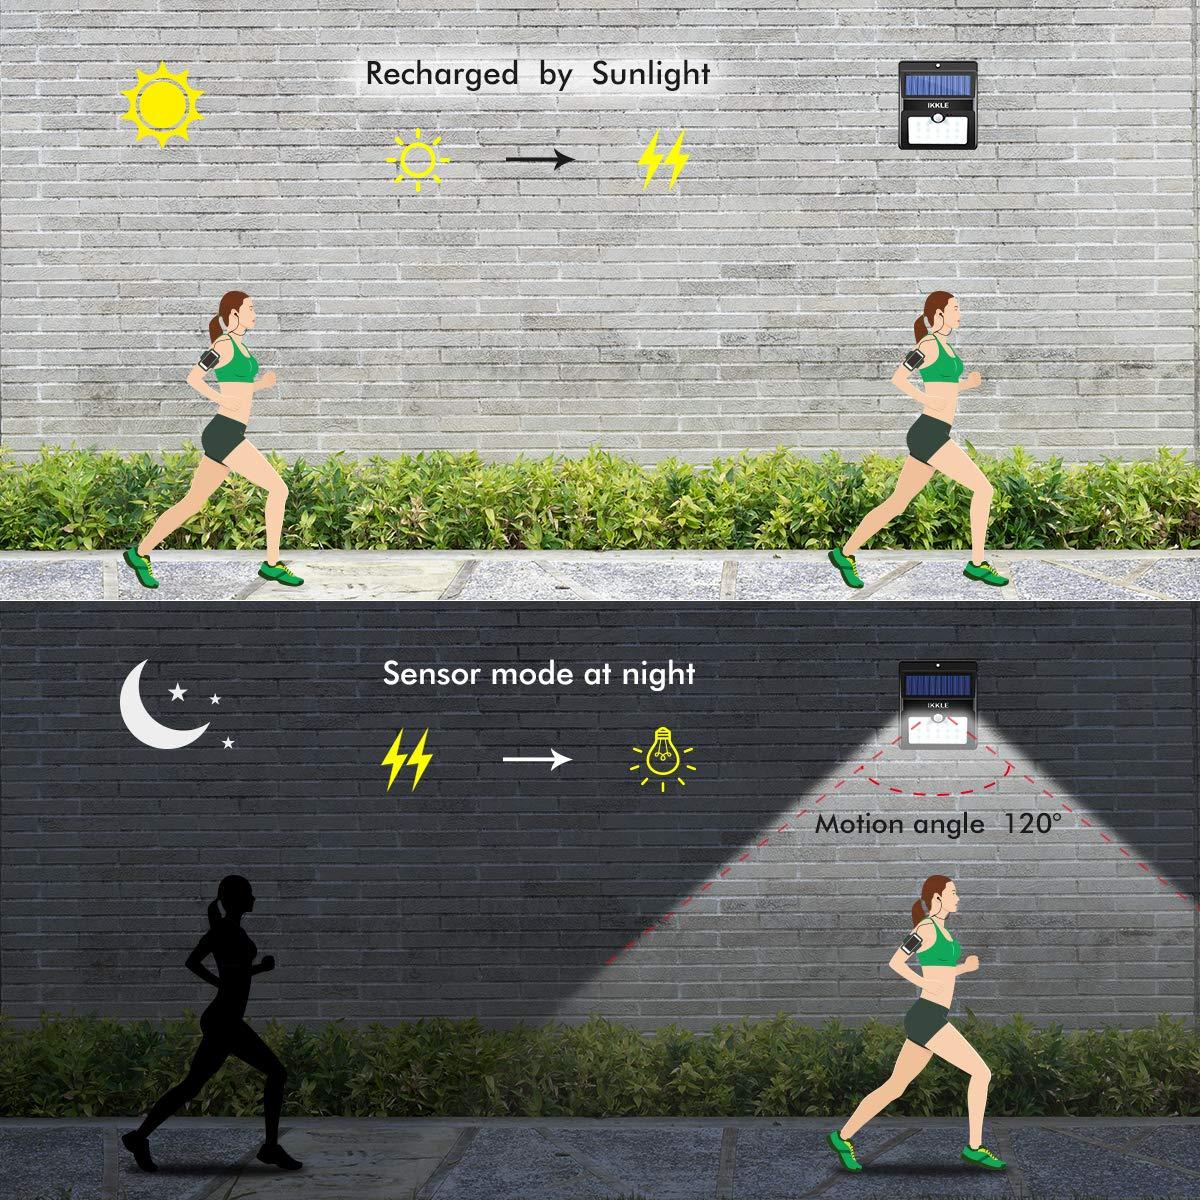 Deck 4 Pack Solar Lights 22 LED Motion Sensor Lights Garden IKKLE Waterproof Outdoor Light for Patio Yard